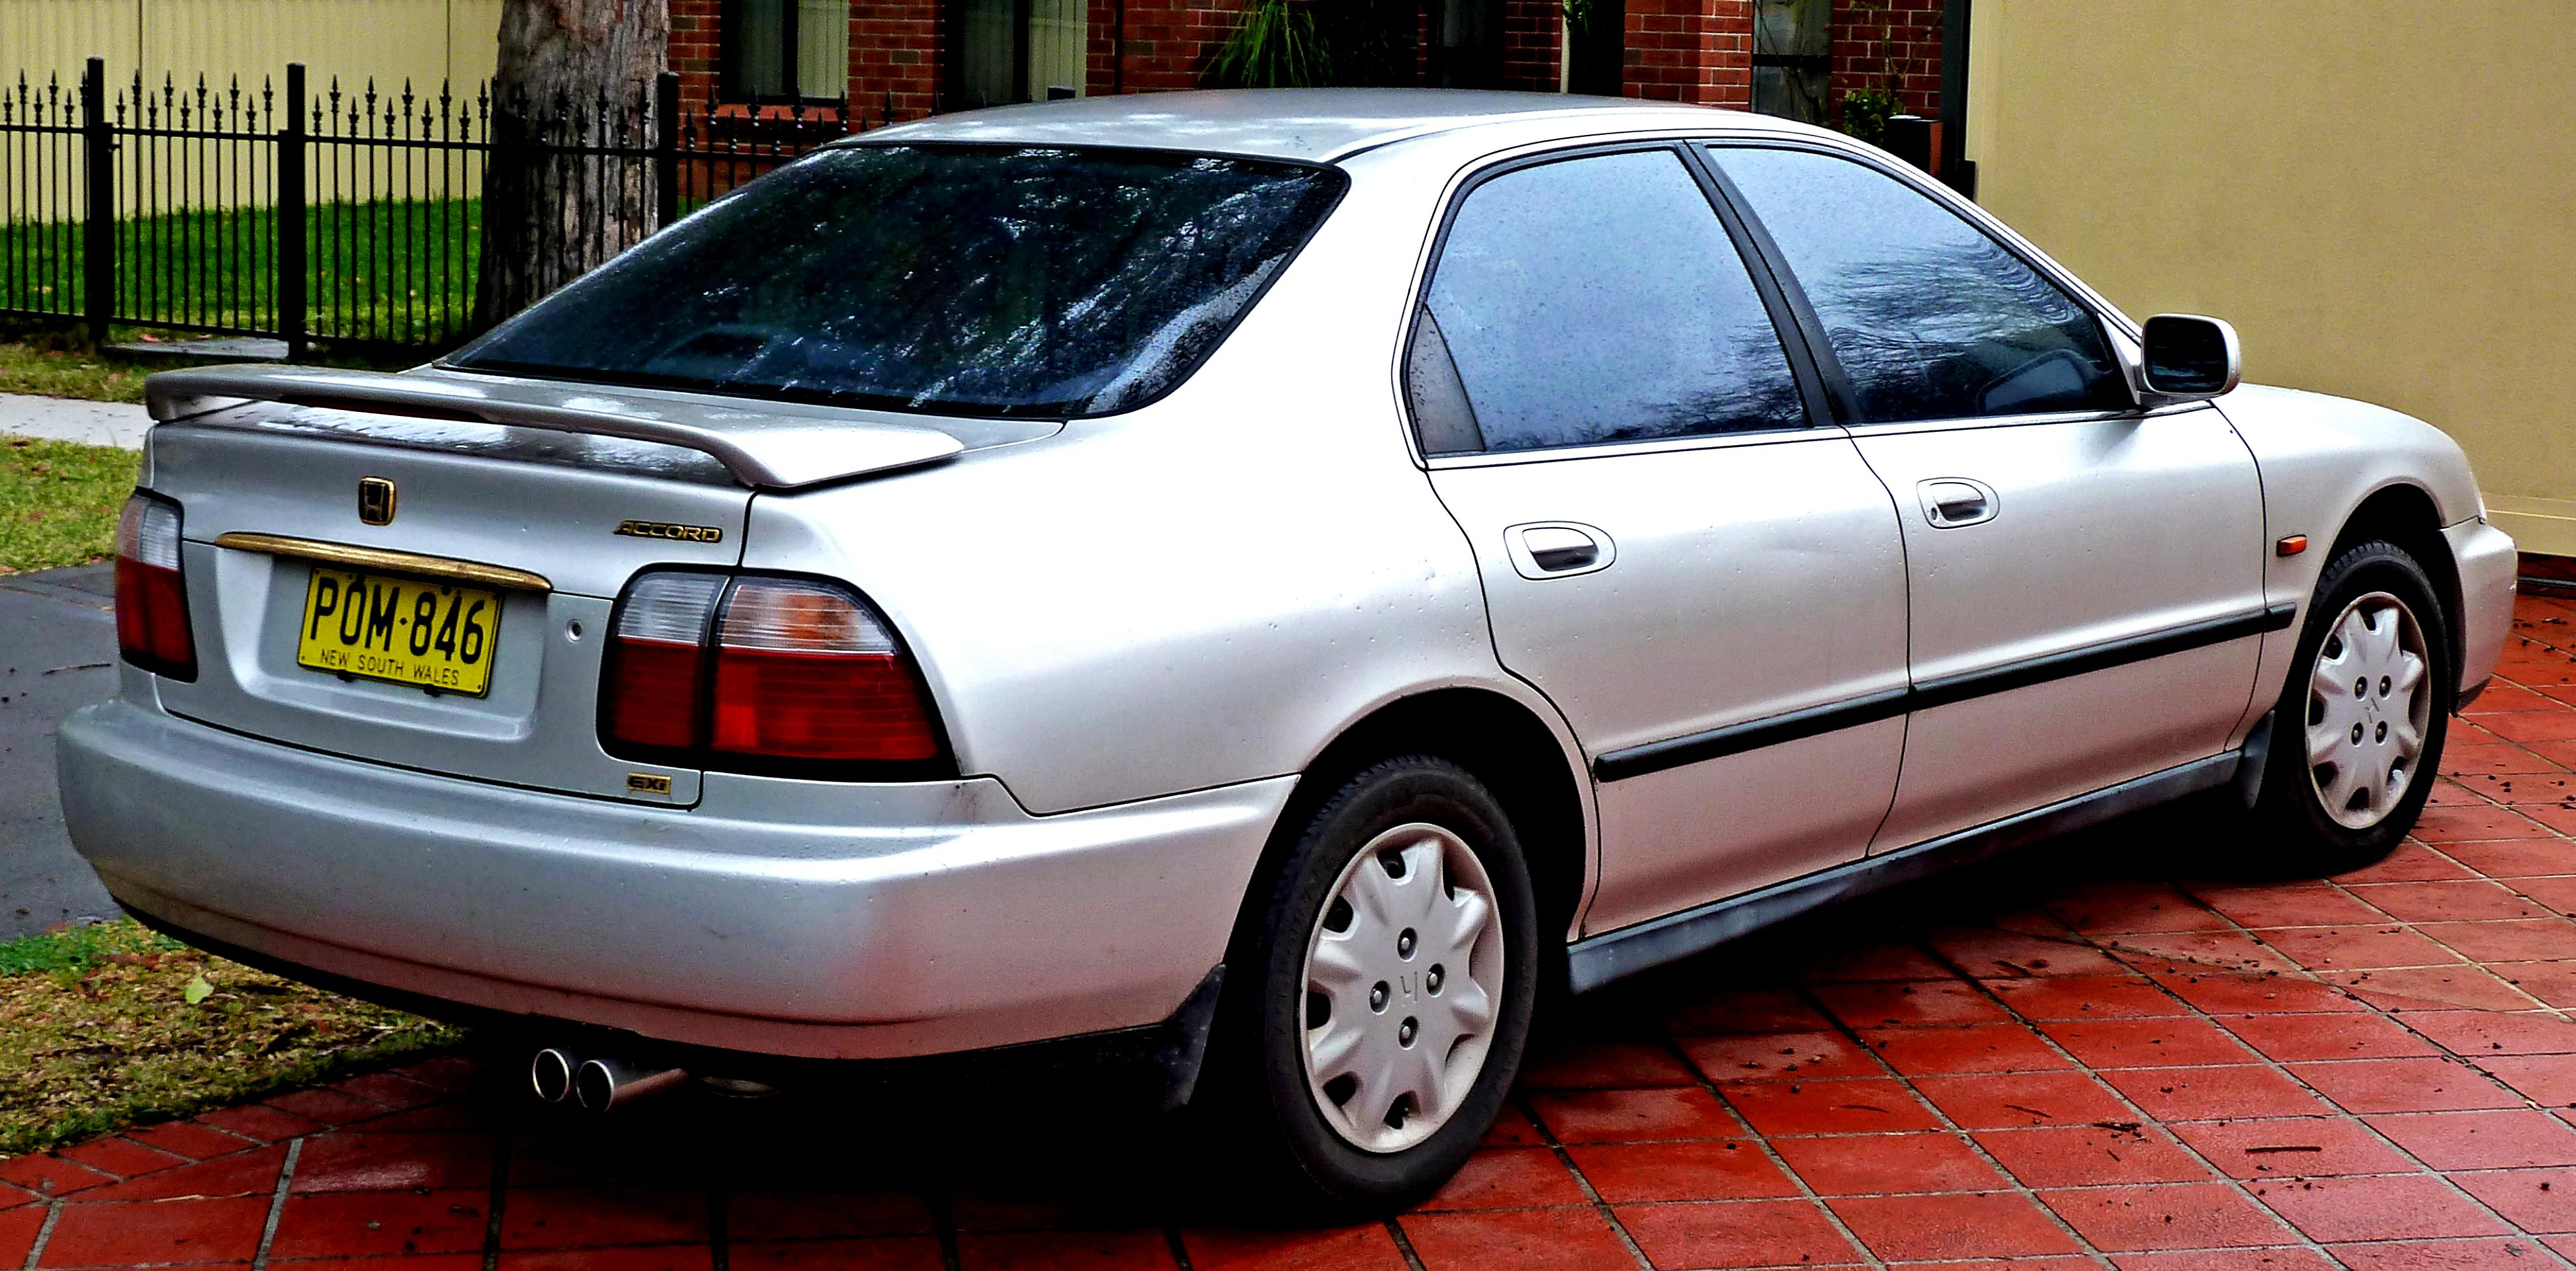 1993 Honda Accord Mpg - Tischde